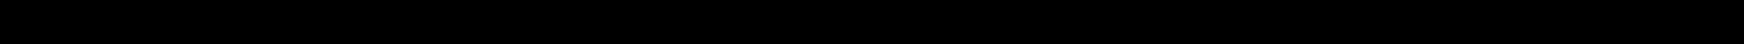 FedraSerifA-Medium.ttf